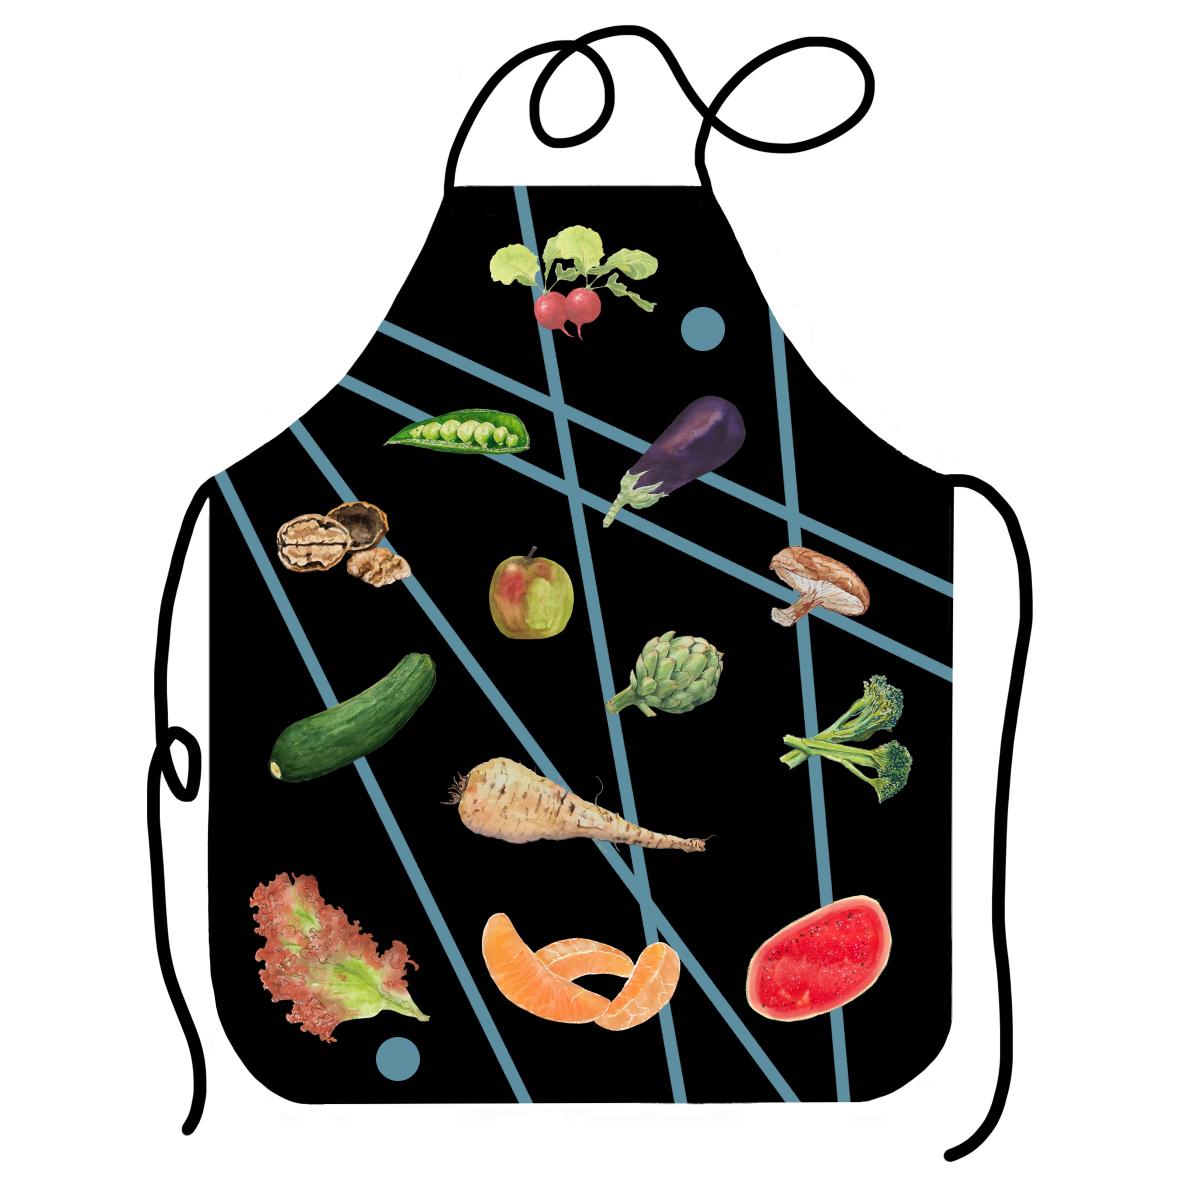 IG veg apron